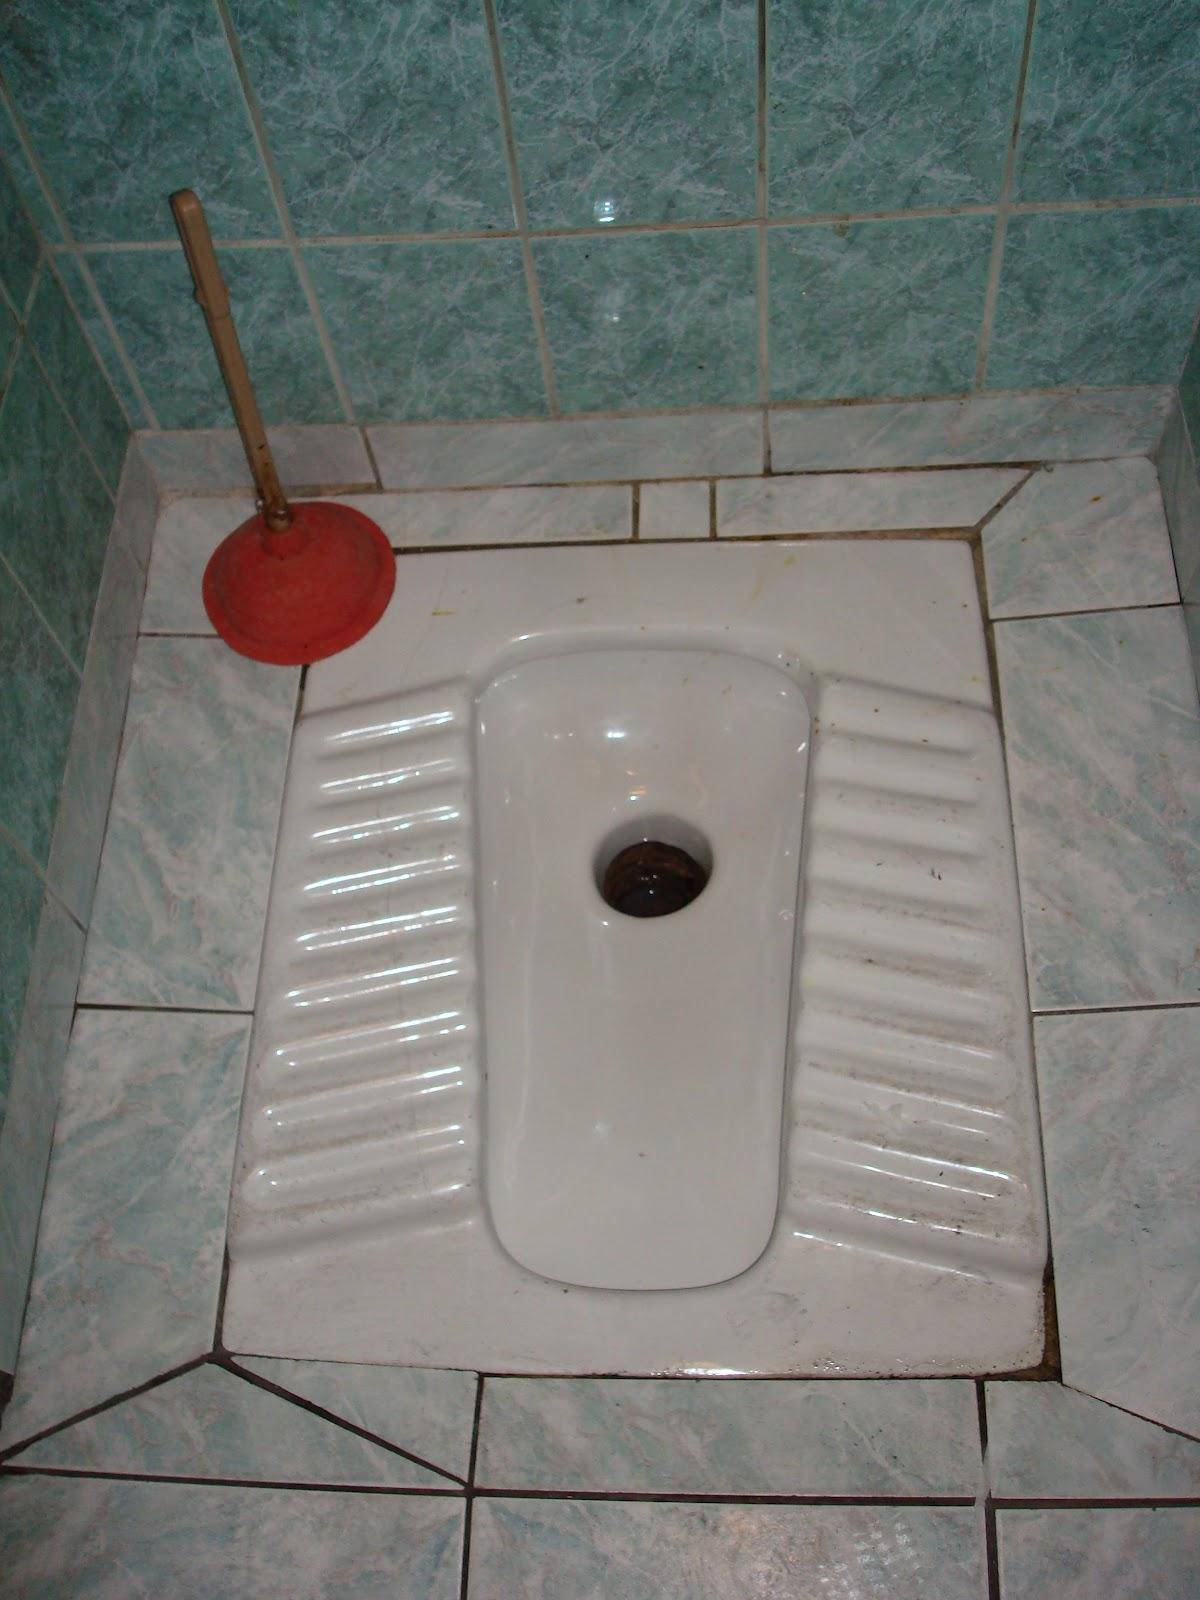 Cultures Bathroom Culture In Turkey